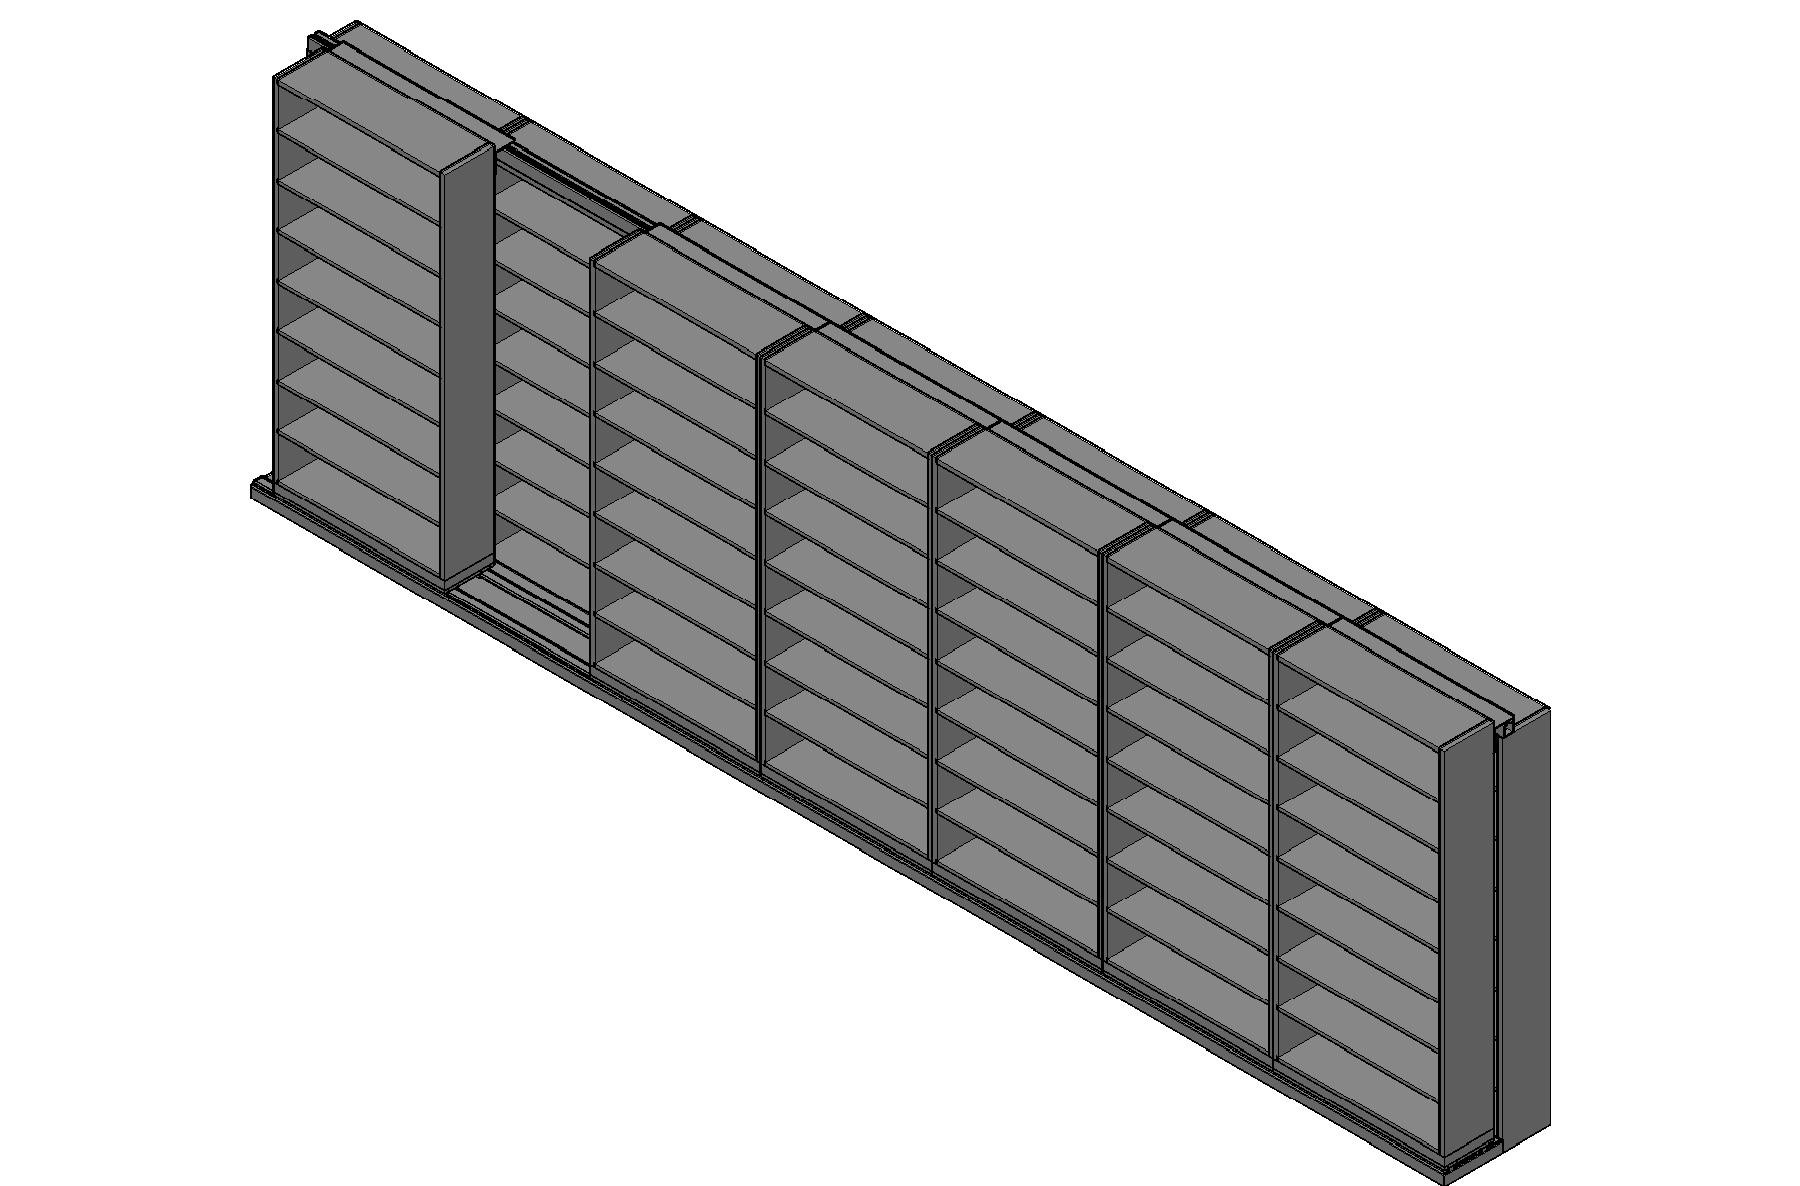 "Letter Size Sliding Shelves - 2 Rows Deep - 8 Levels - (42"" x 12"" Shelves) - 298"" Total Width"